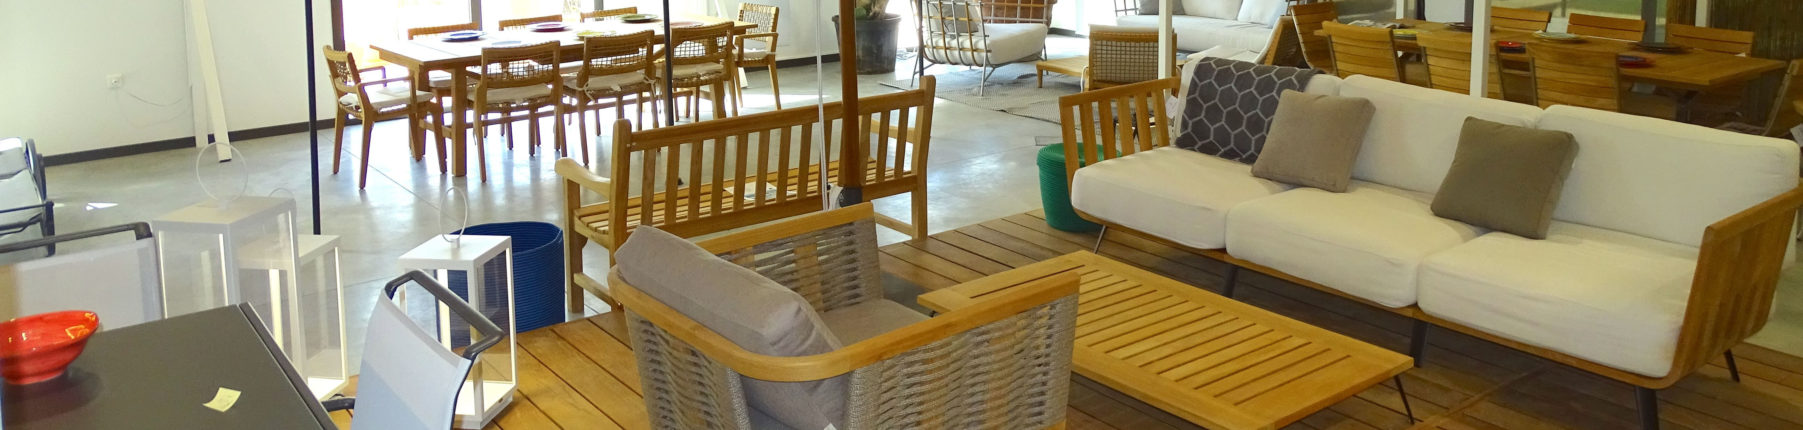 Mobilier jardin : UNOPIU | CEDRIC PIERRE PAYSAGE